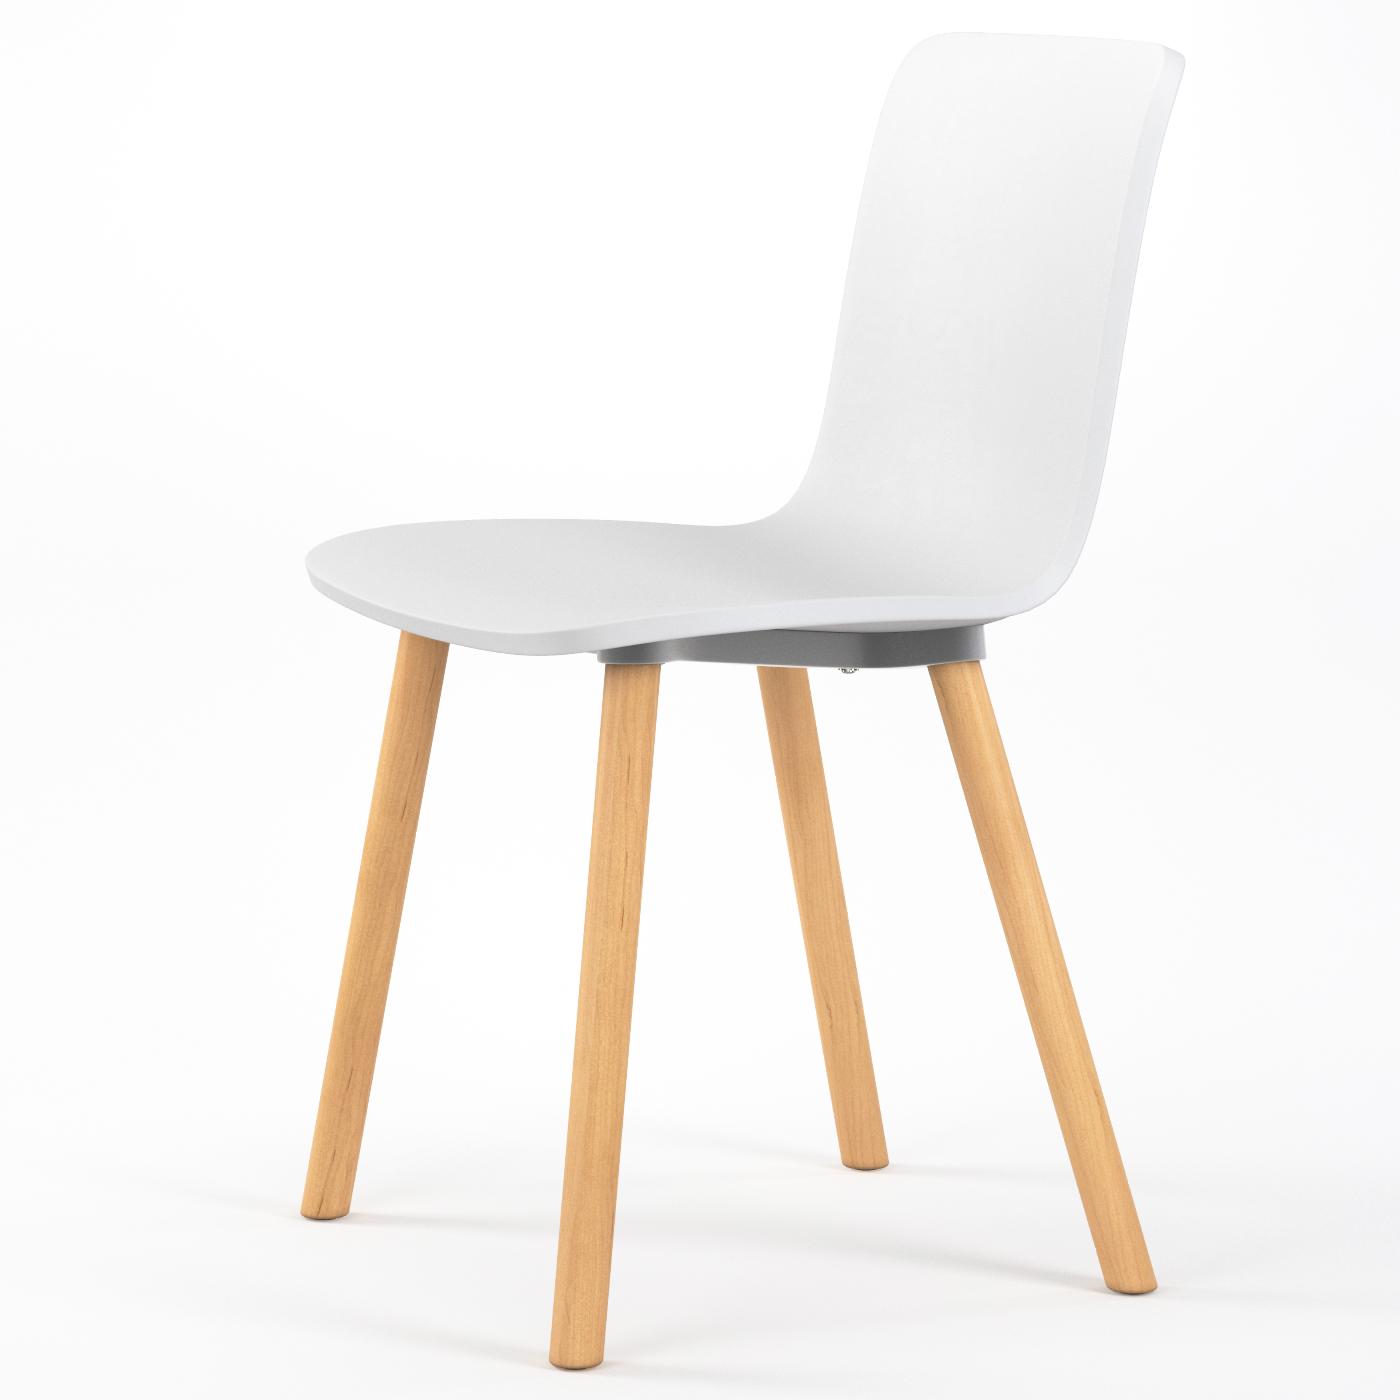 Studio Plastic Modern Dining Chair in White